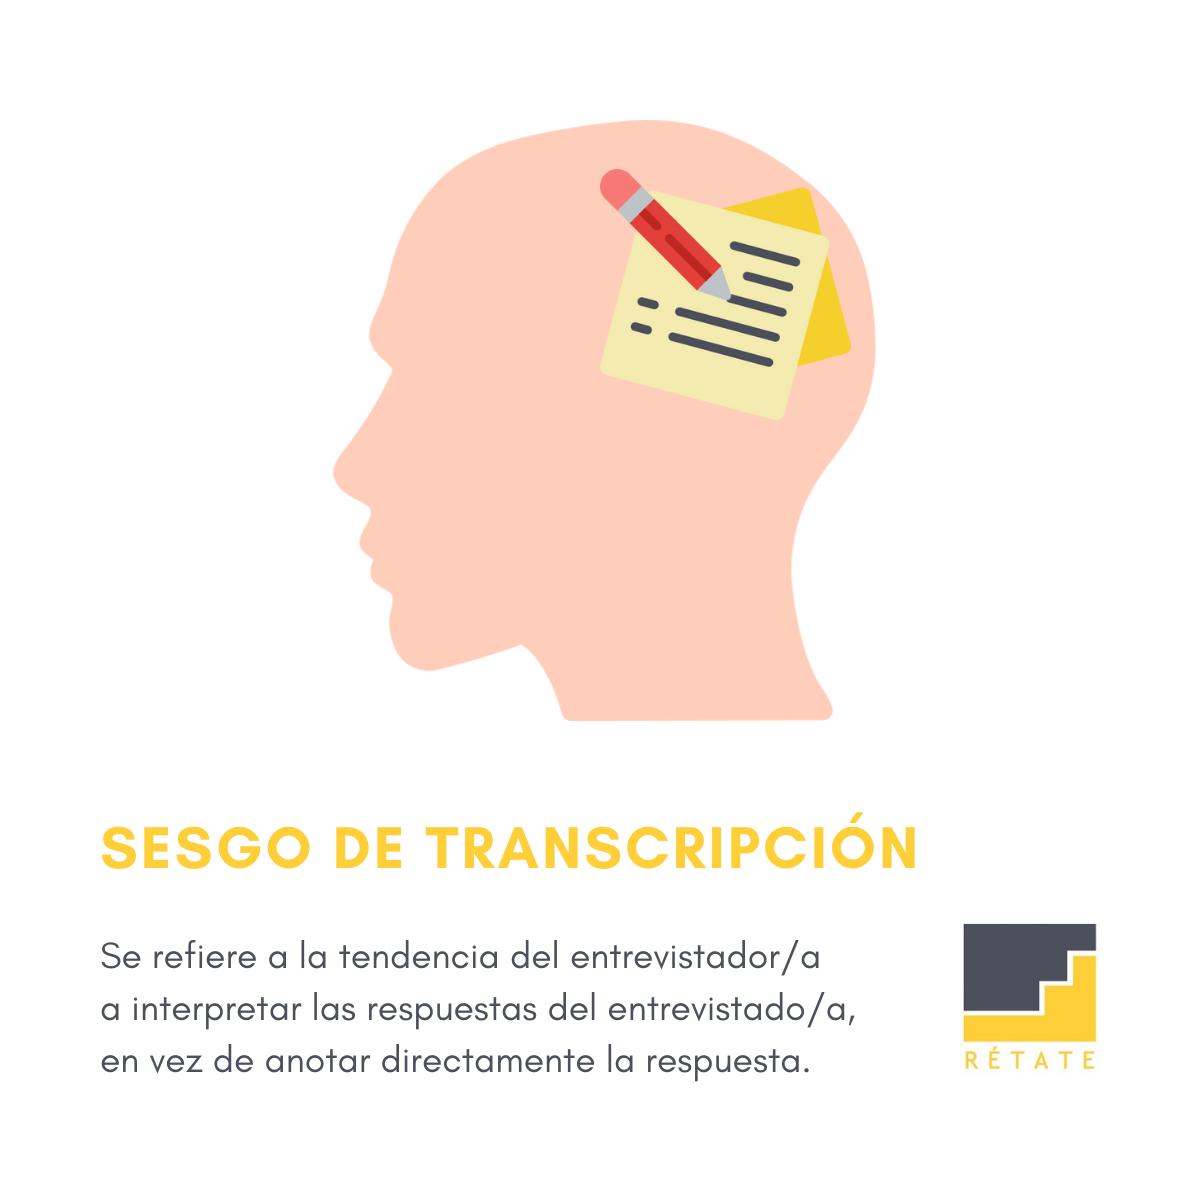 Sesgo de transcripción